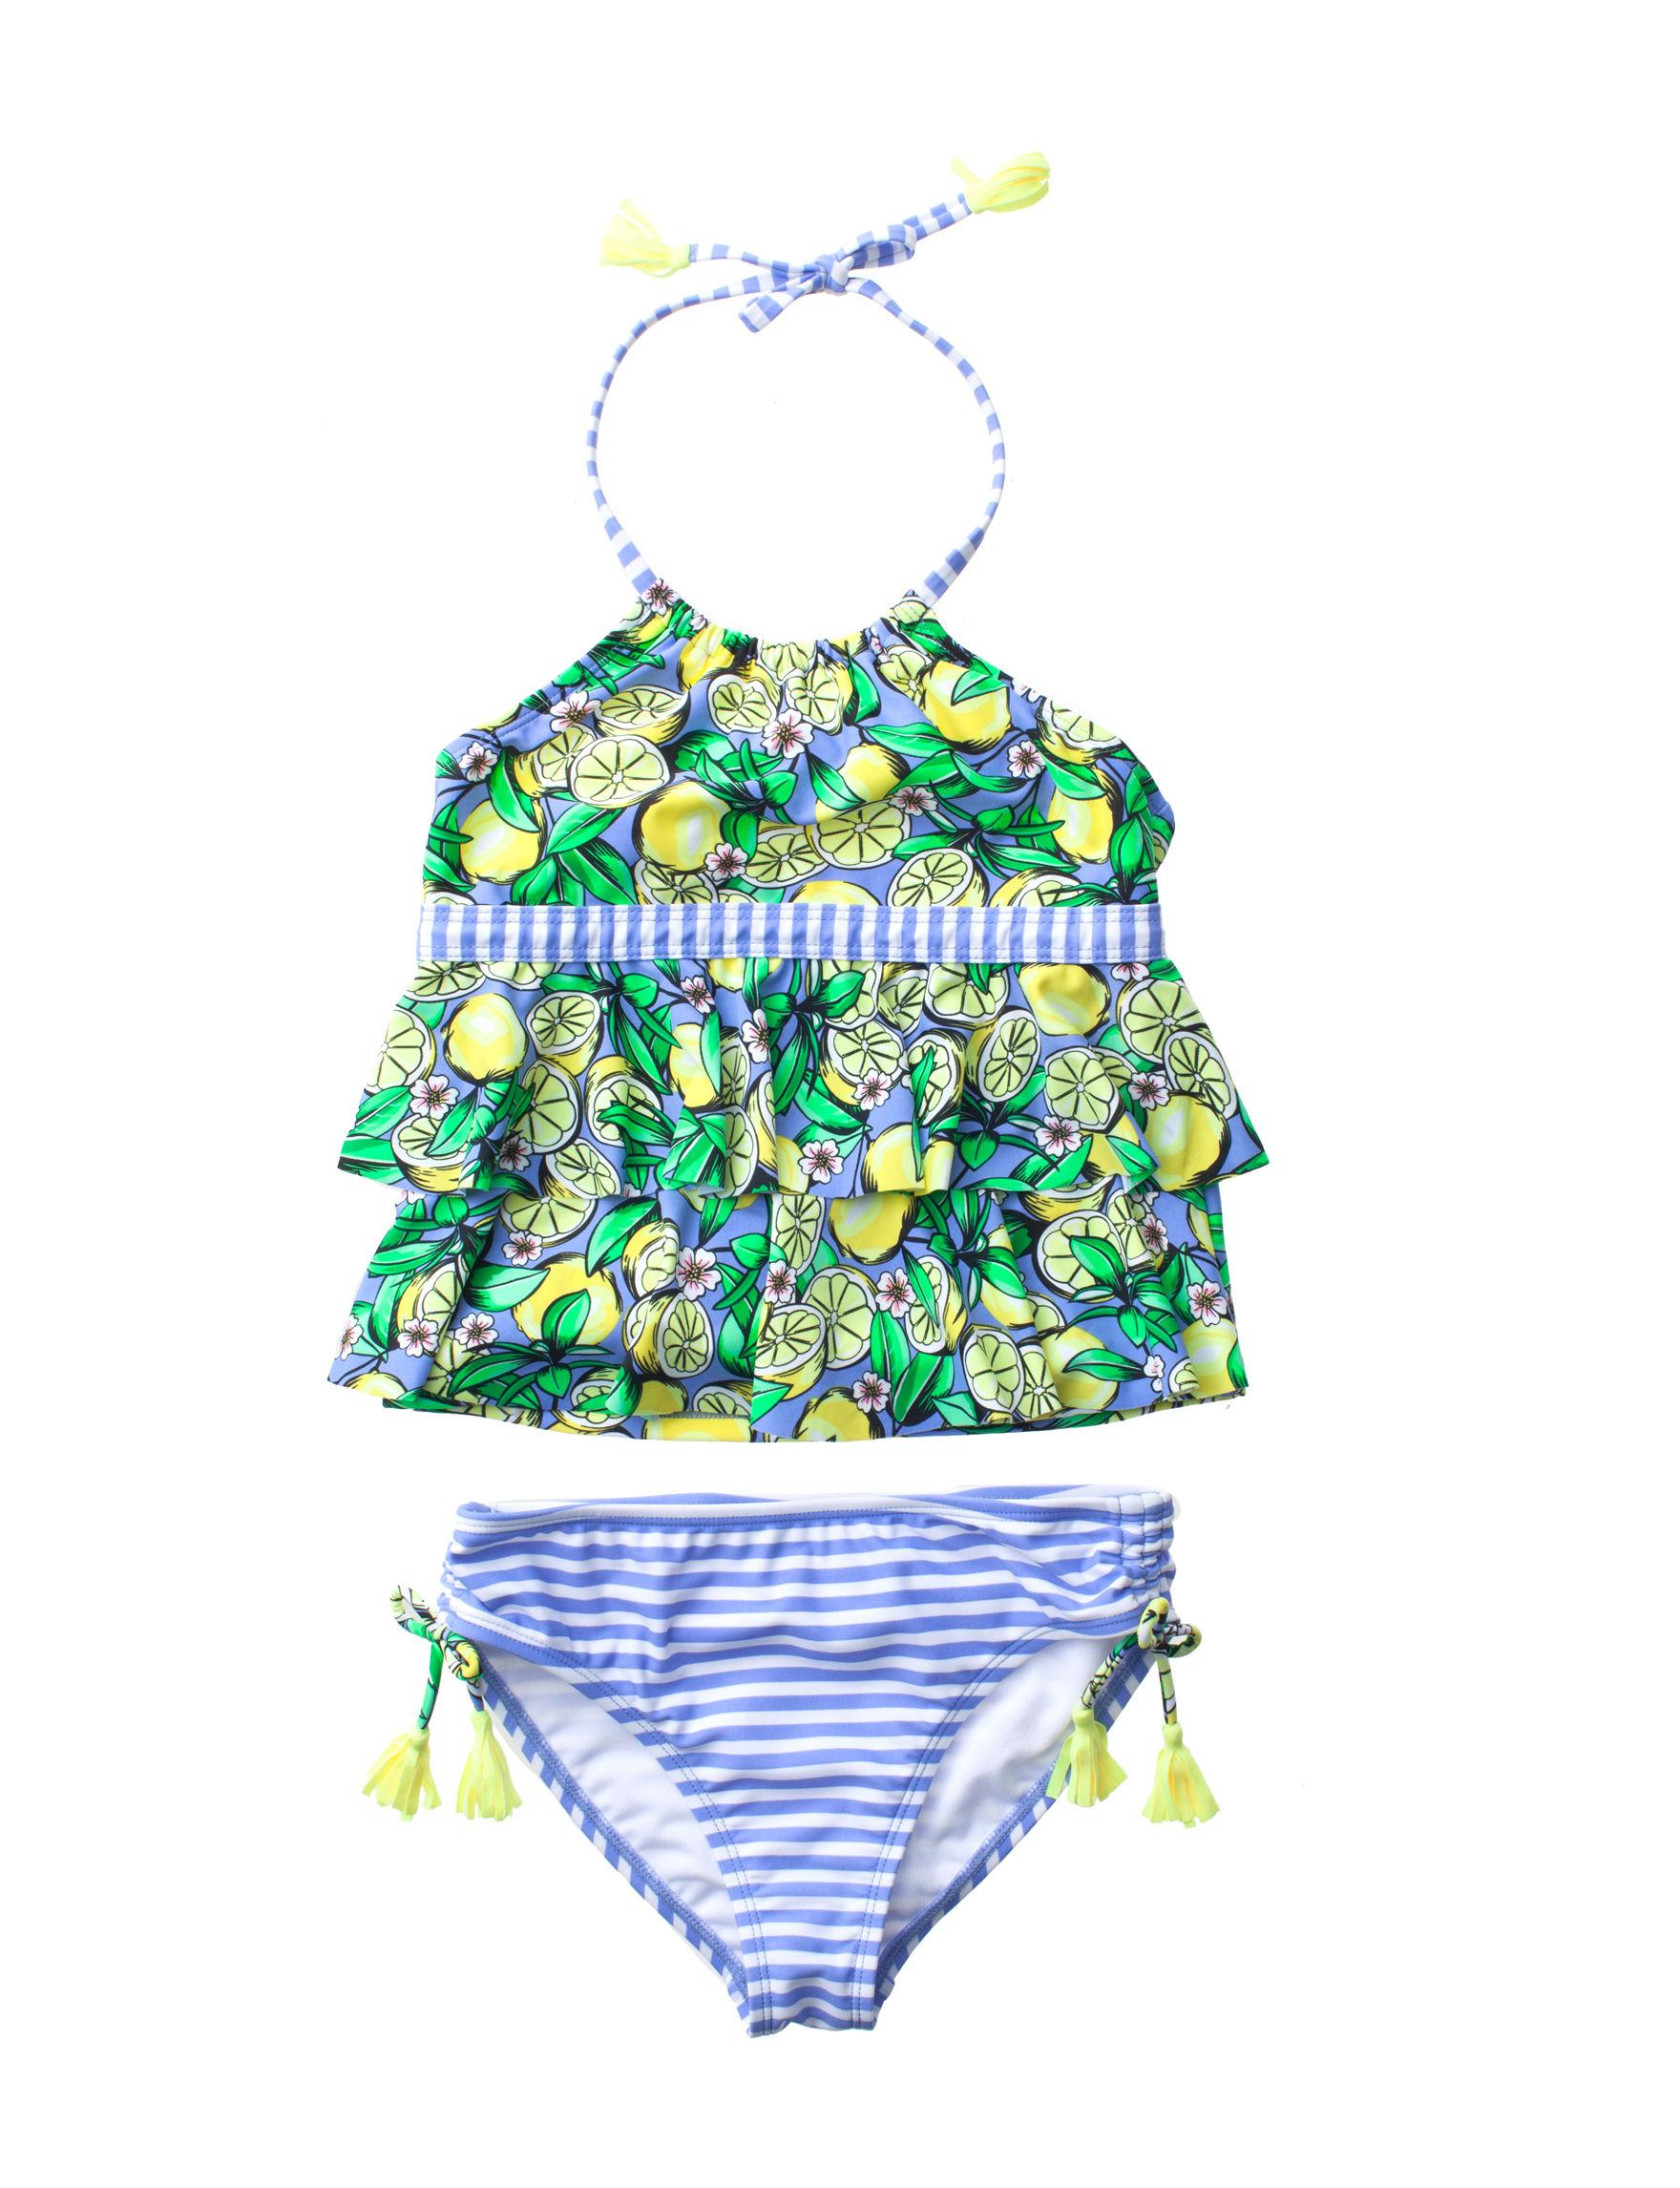 2c0c677a37a77 Angel Beach 2-pc. Citrus Crush Tankini Swim Set - Girls 7-16 | Stage ...